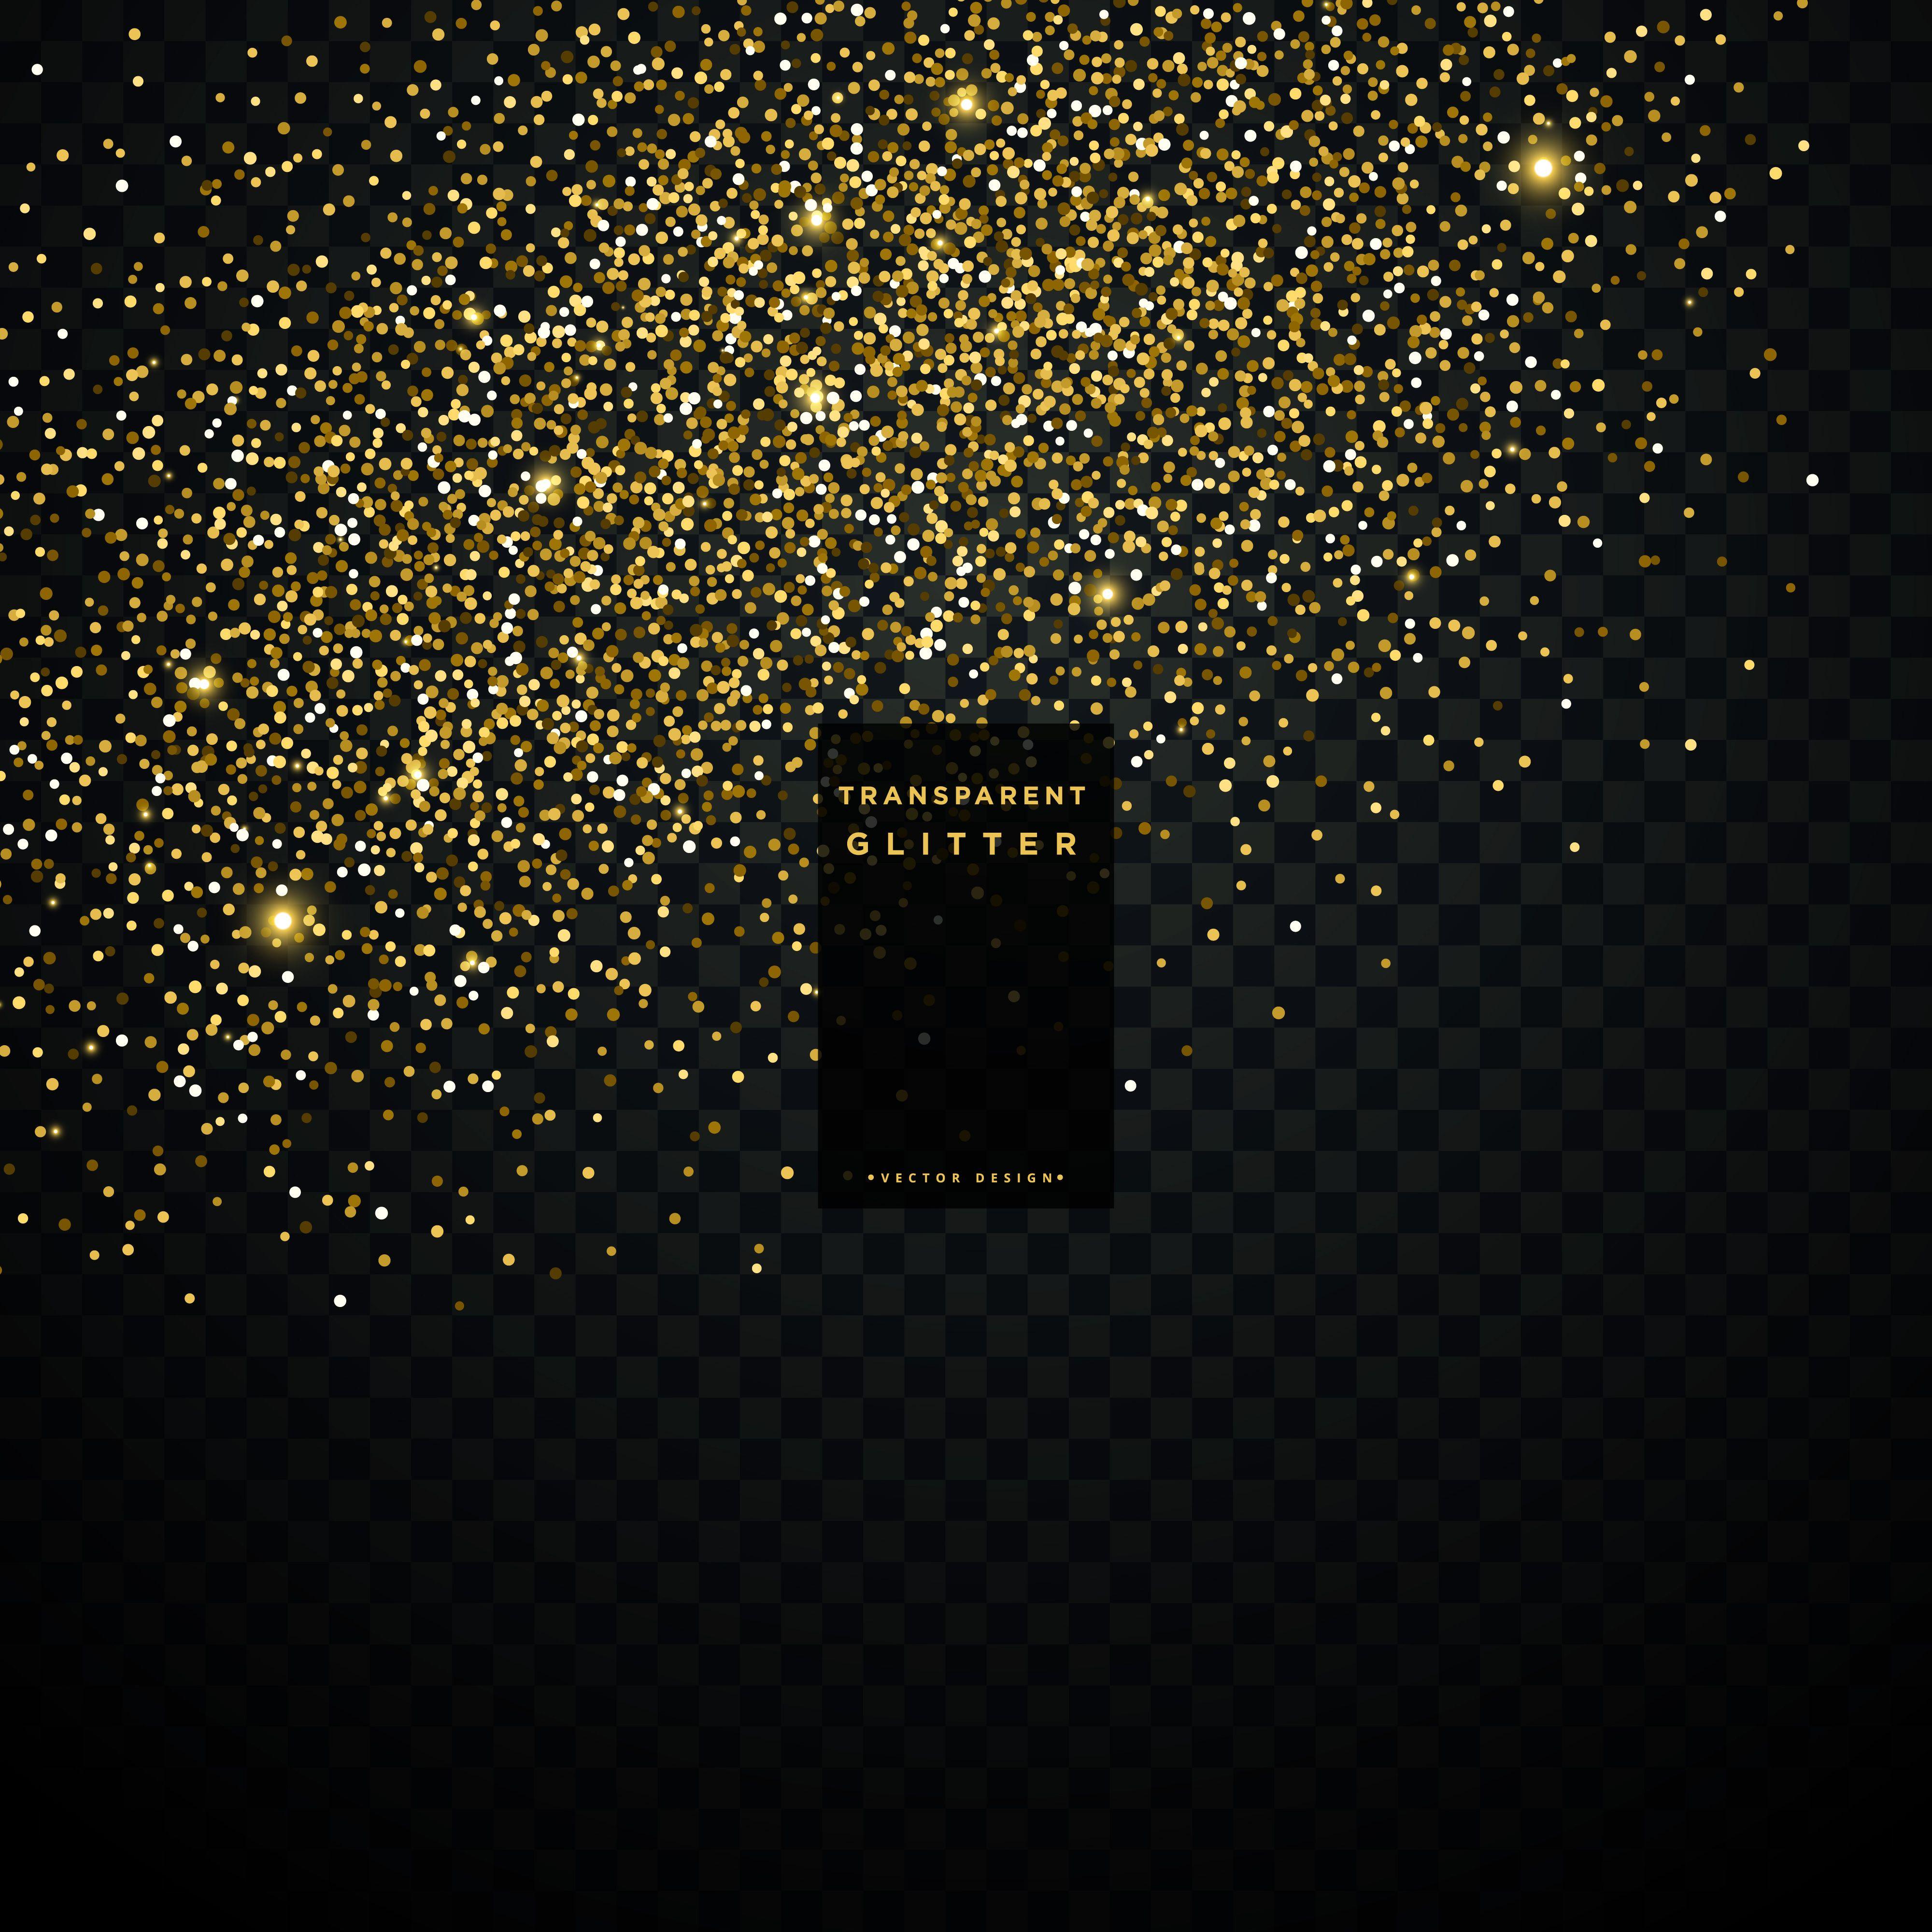 Golden Glitter Particle Dust Transparent Background Vector Choose From Thousands Of Free Vectors Clip Art Designs Icon Vector Art Design Clip Art Vector Art